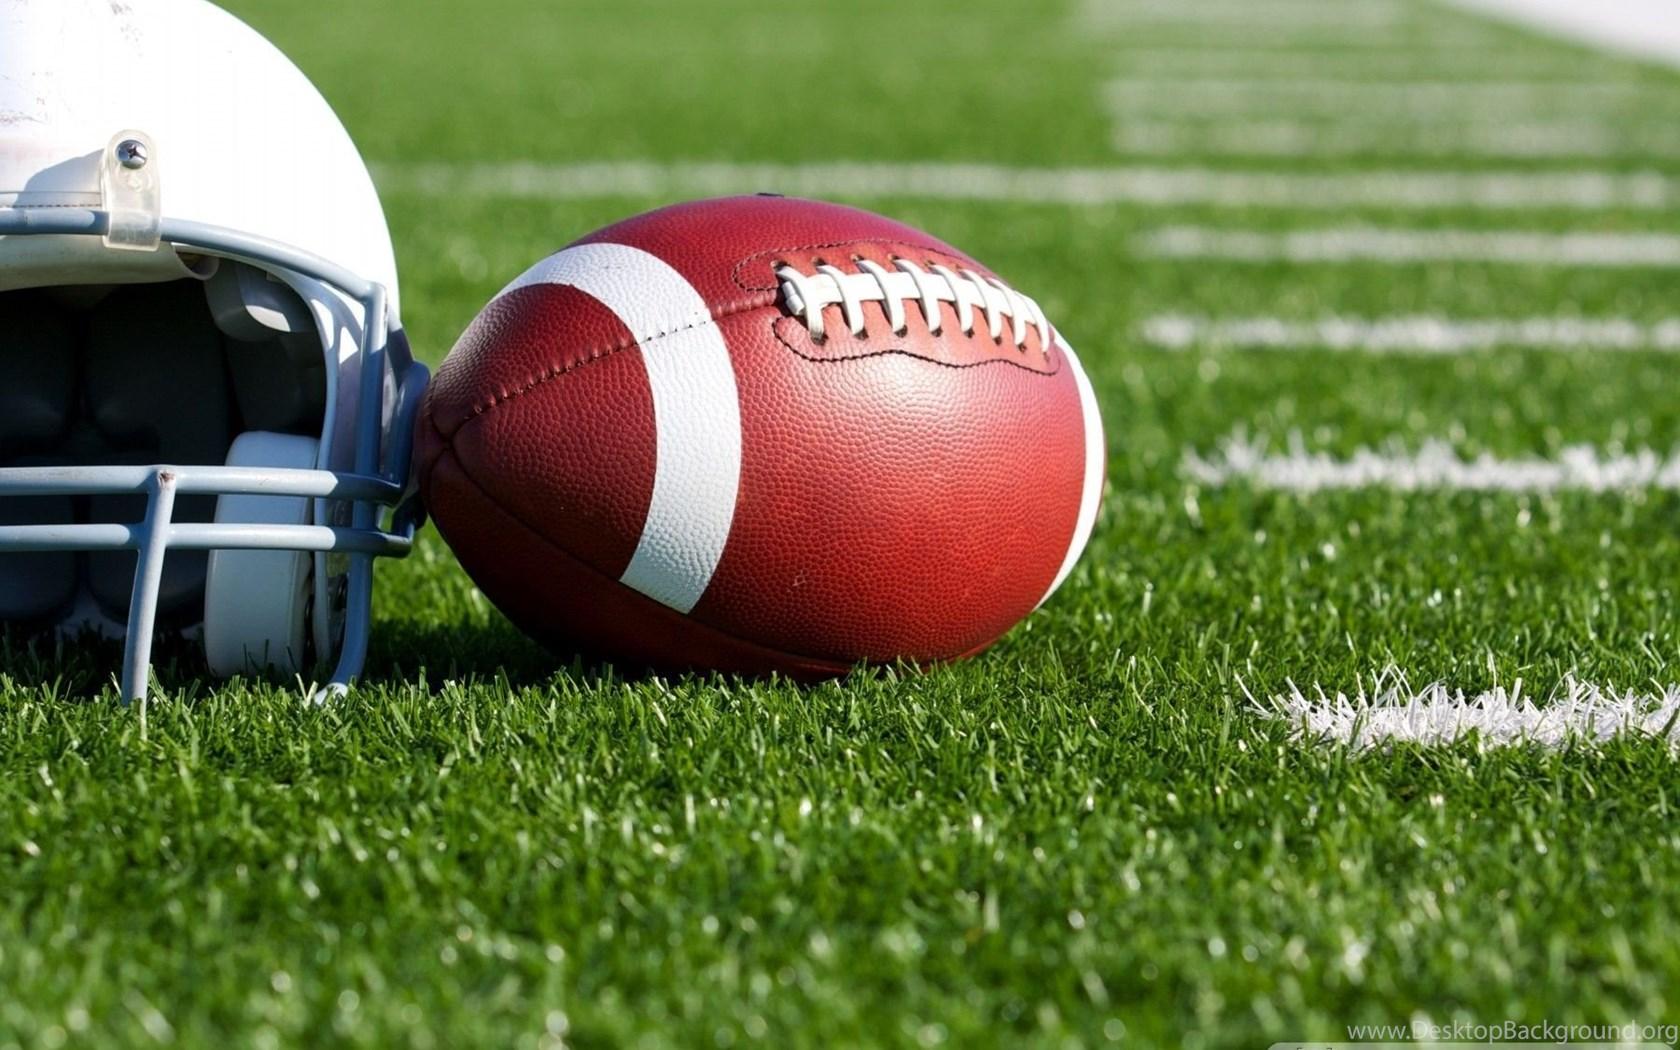 Football with Helmet on the Field.jpg Desktop Background